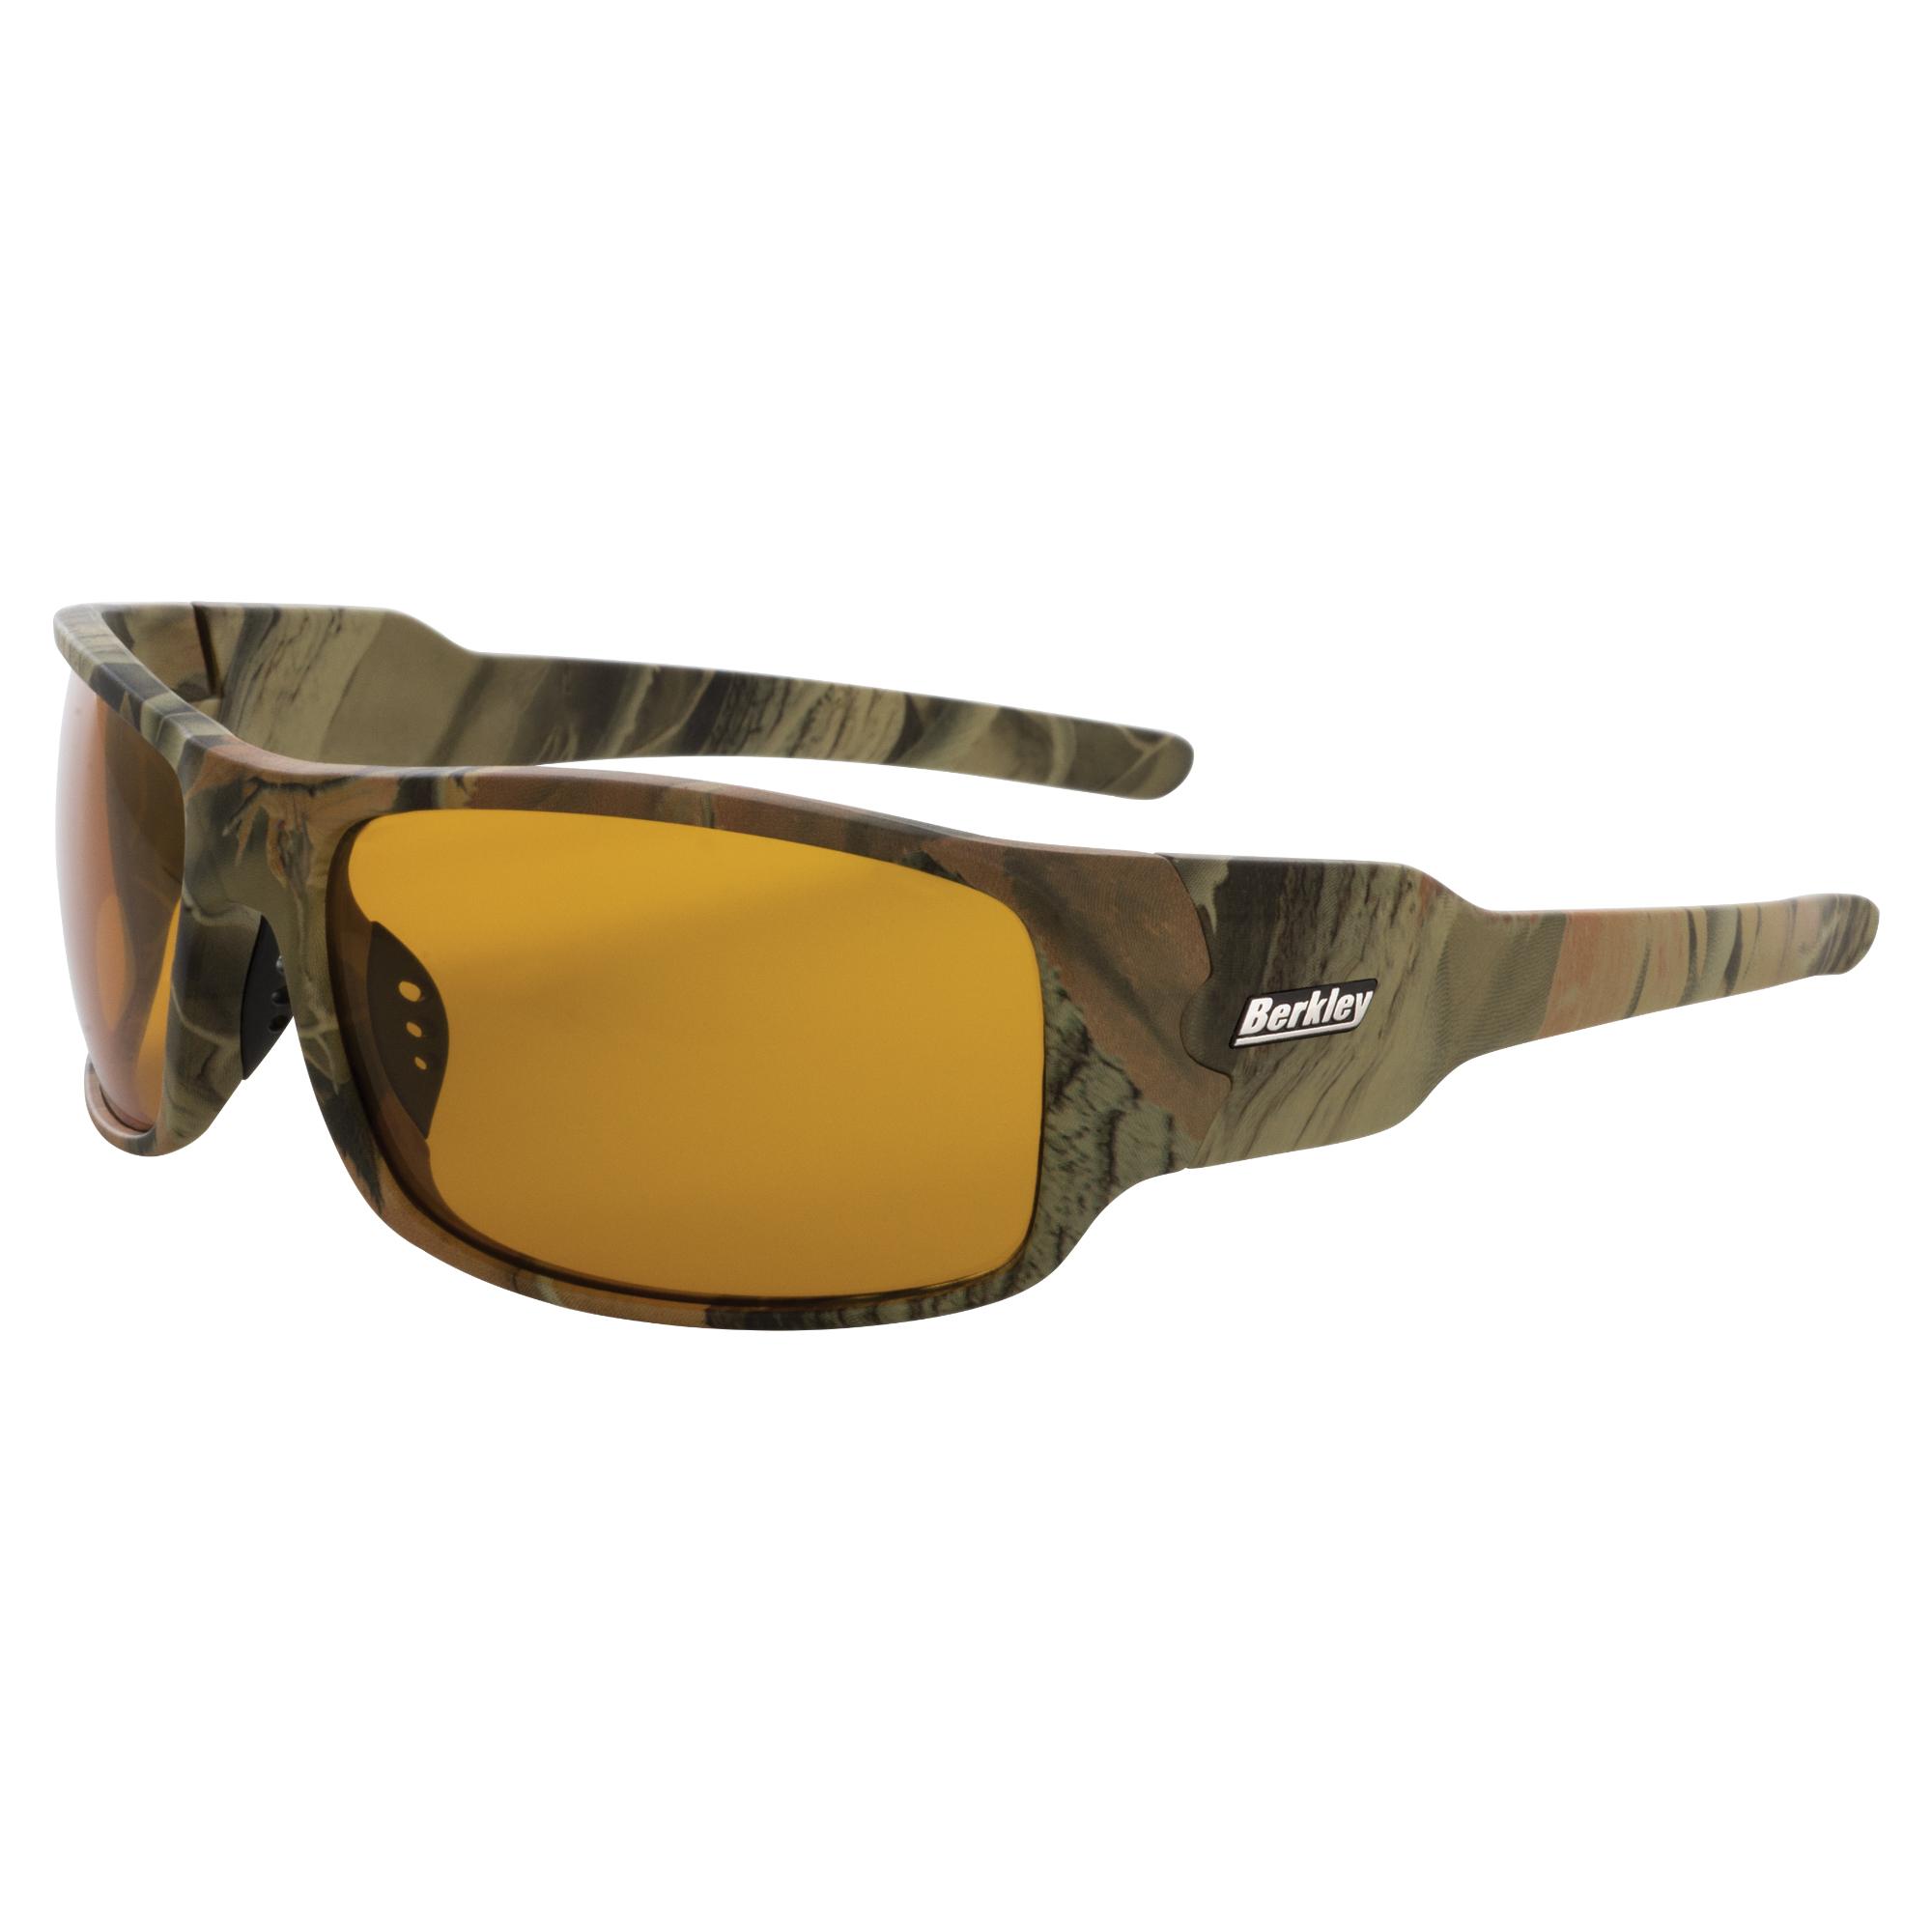 berkley norfolk sunglasses ebay